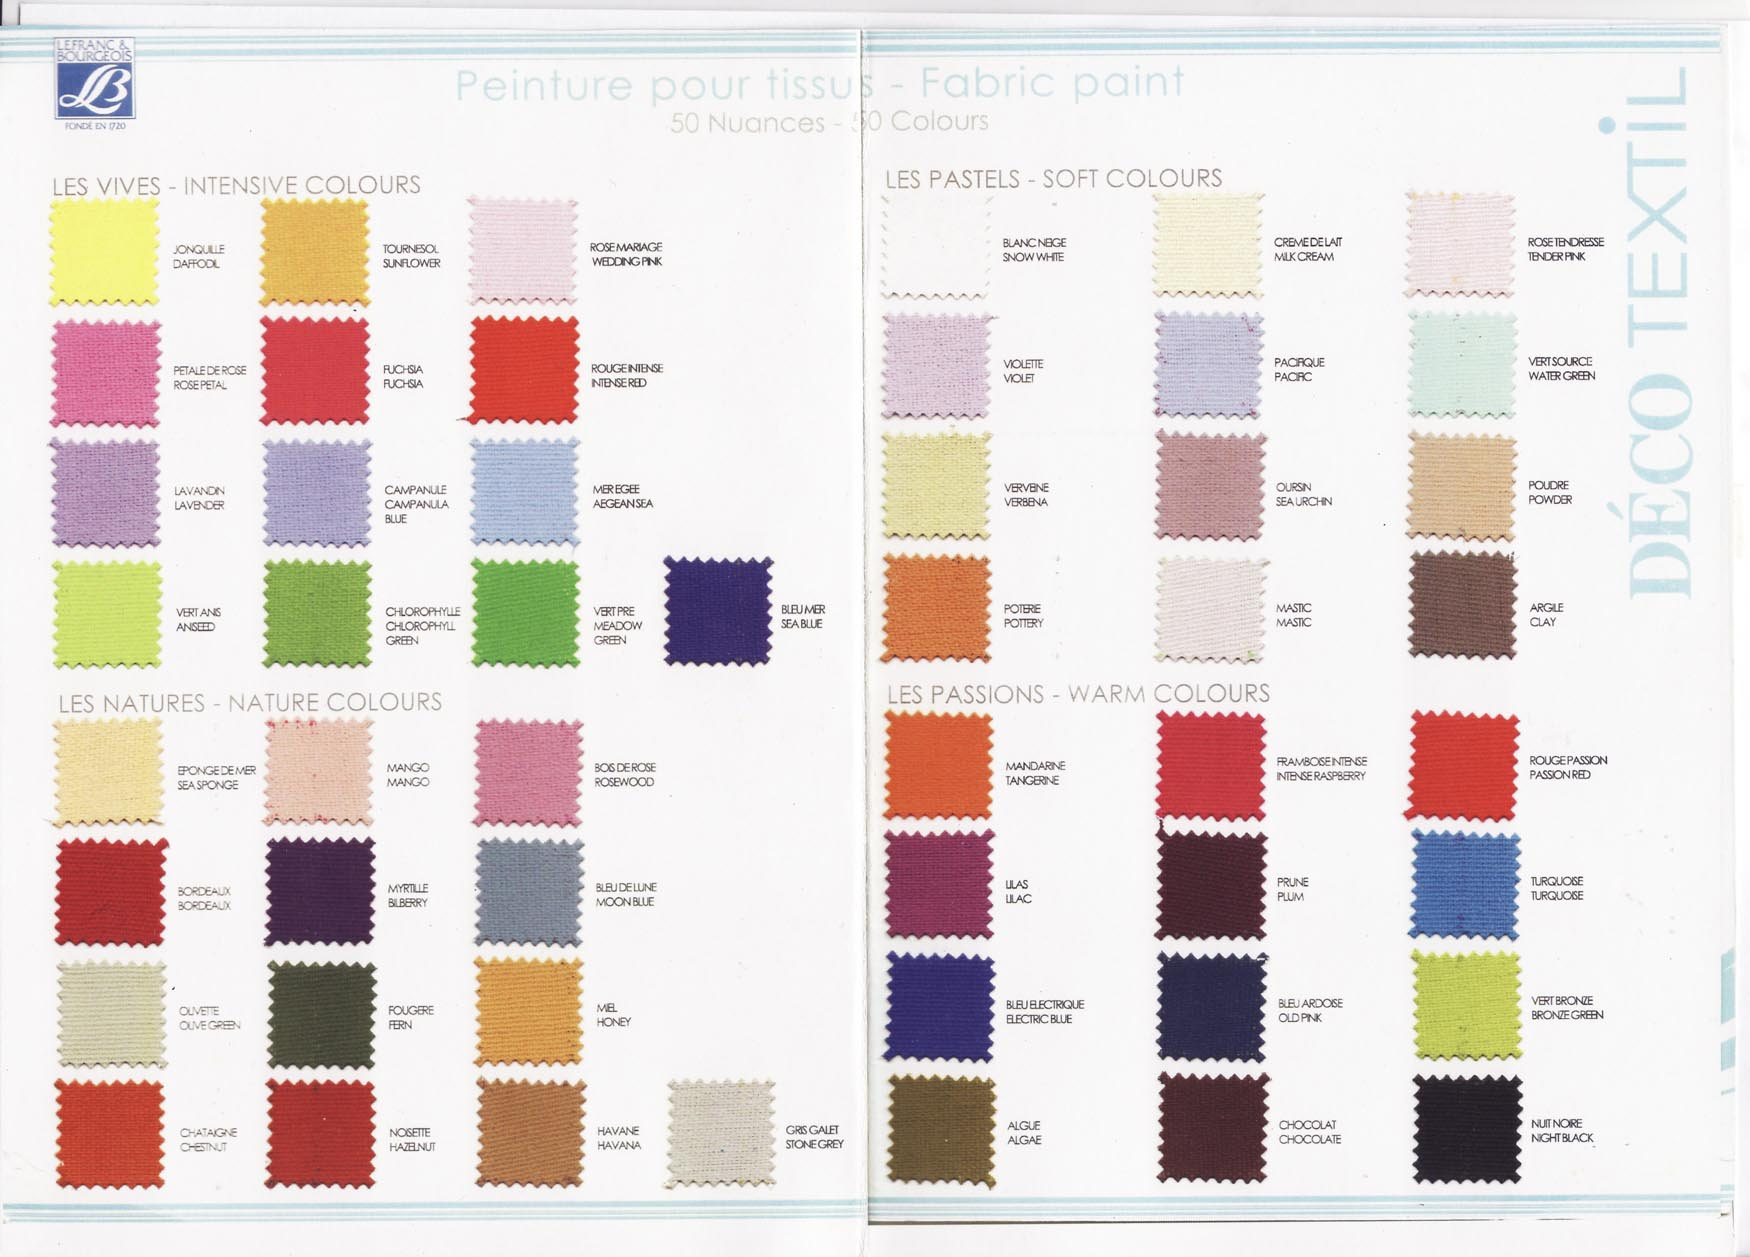 jotun paint catalogue ajilbabcom portal picture car. Black Bedroom Furniture Sets. Home Design Ideas